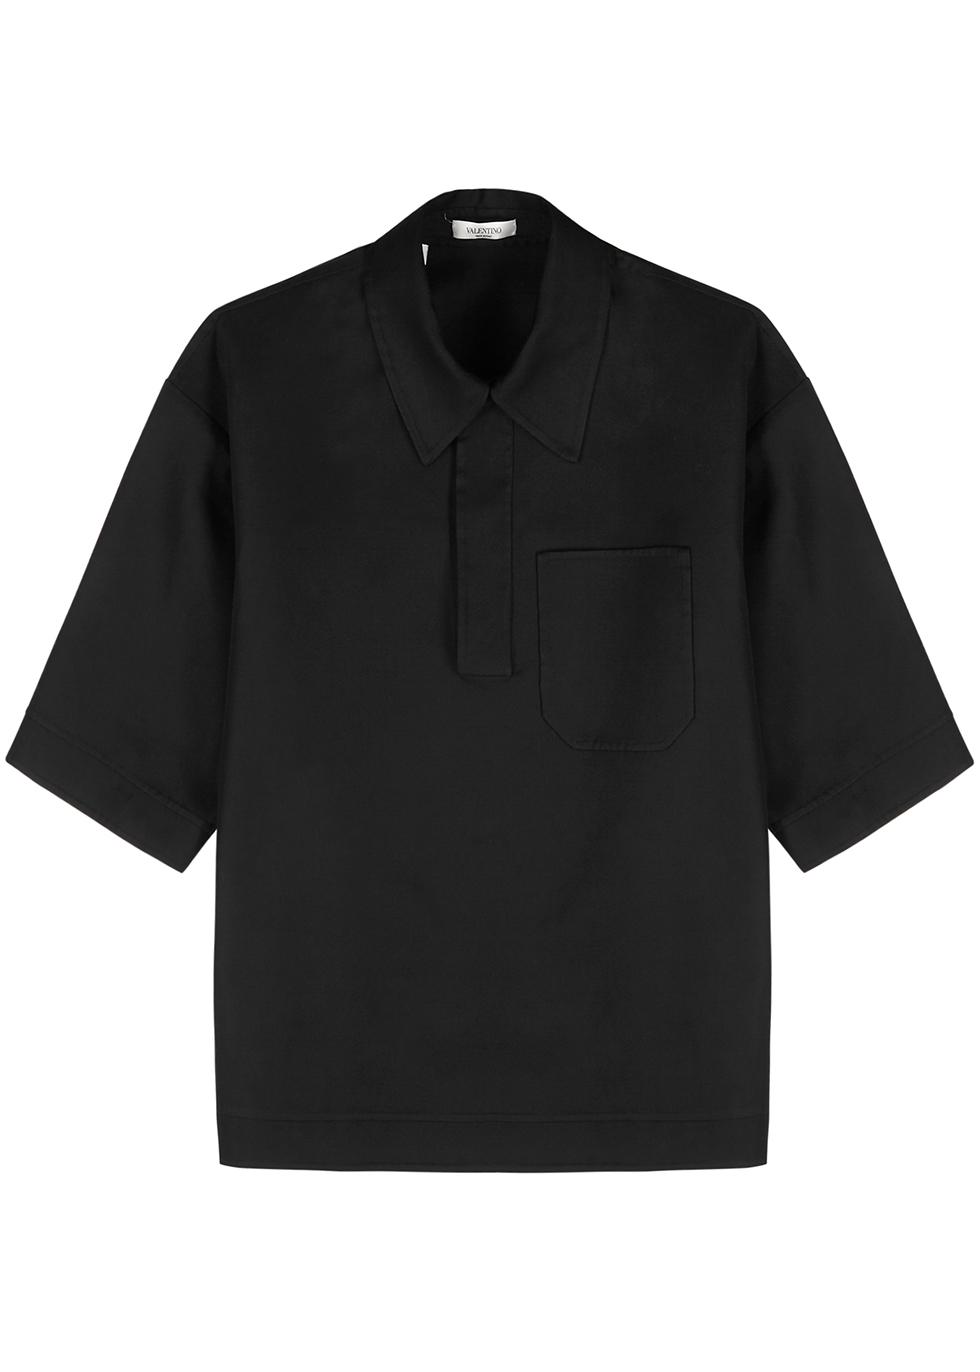 Black twill shirt